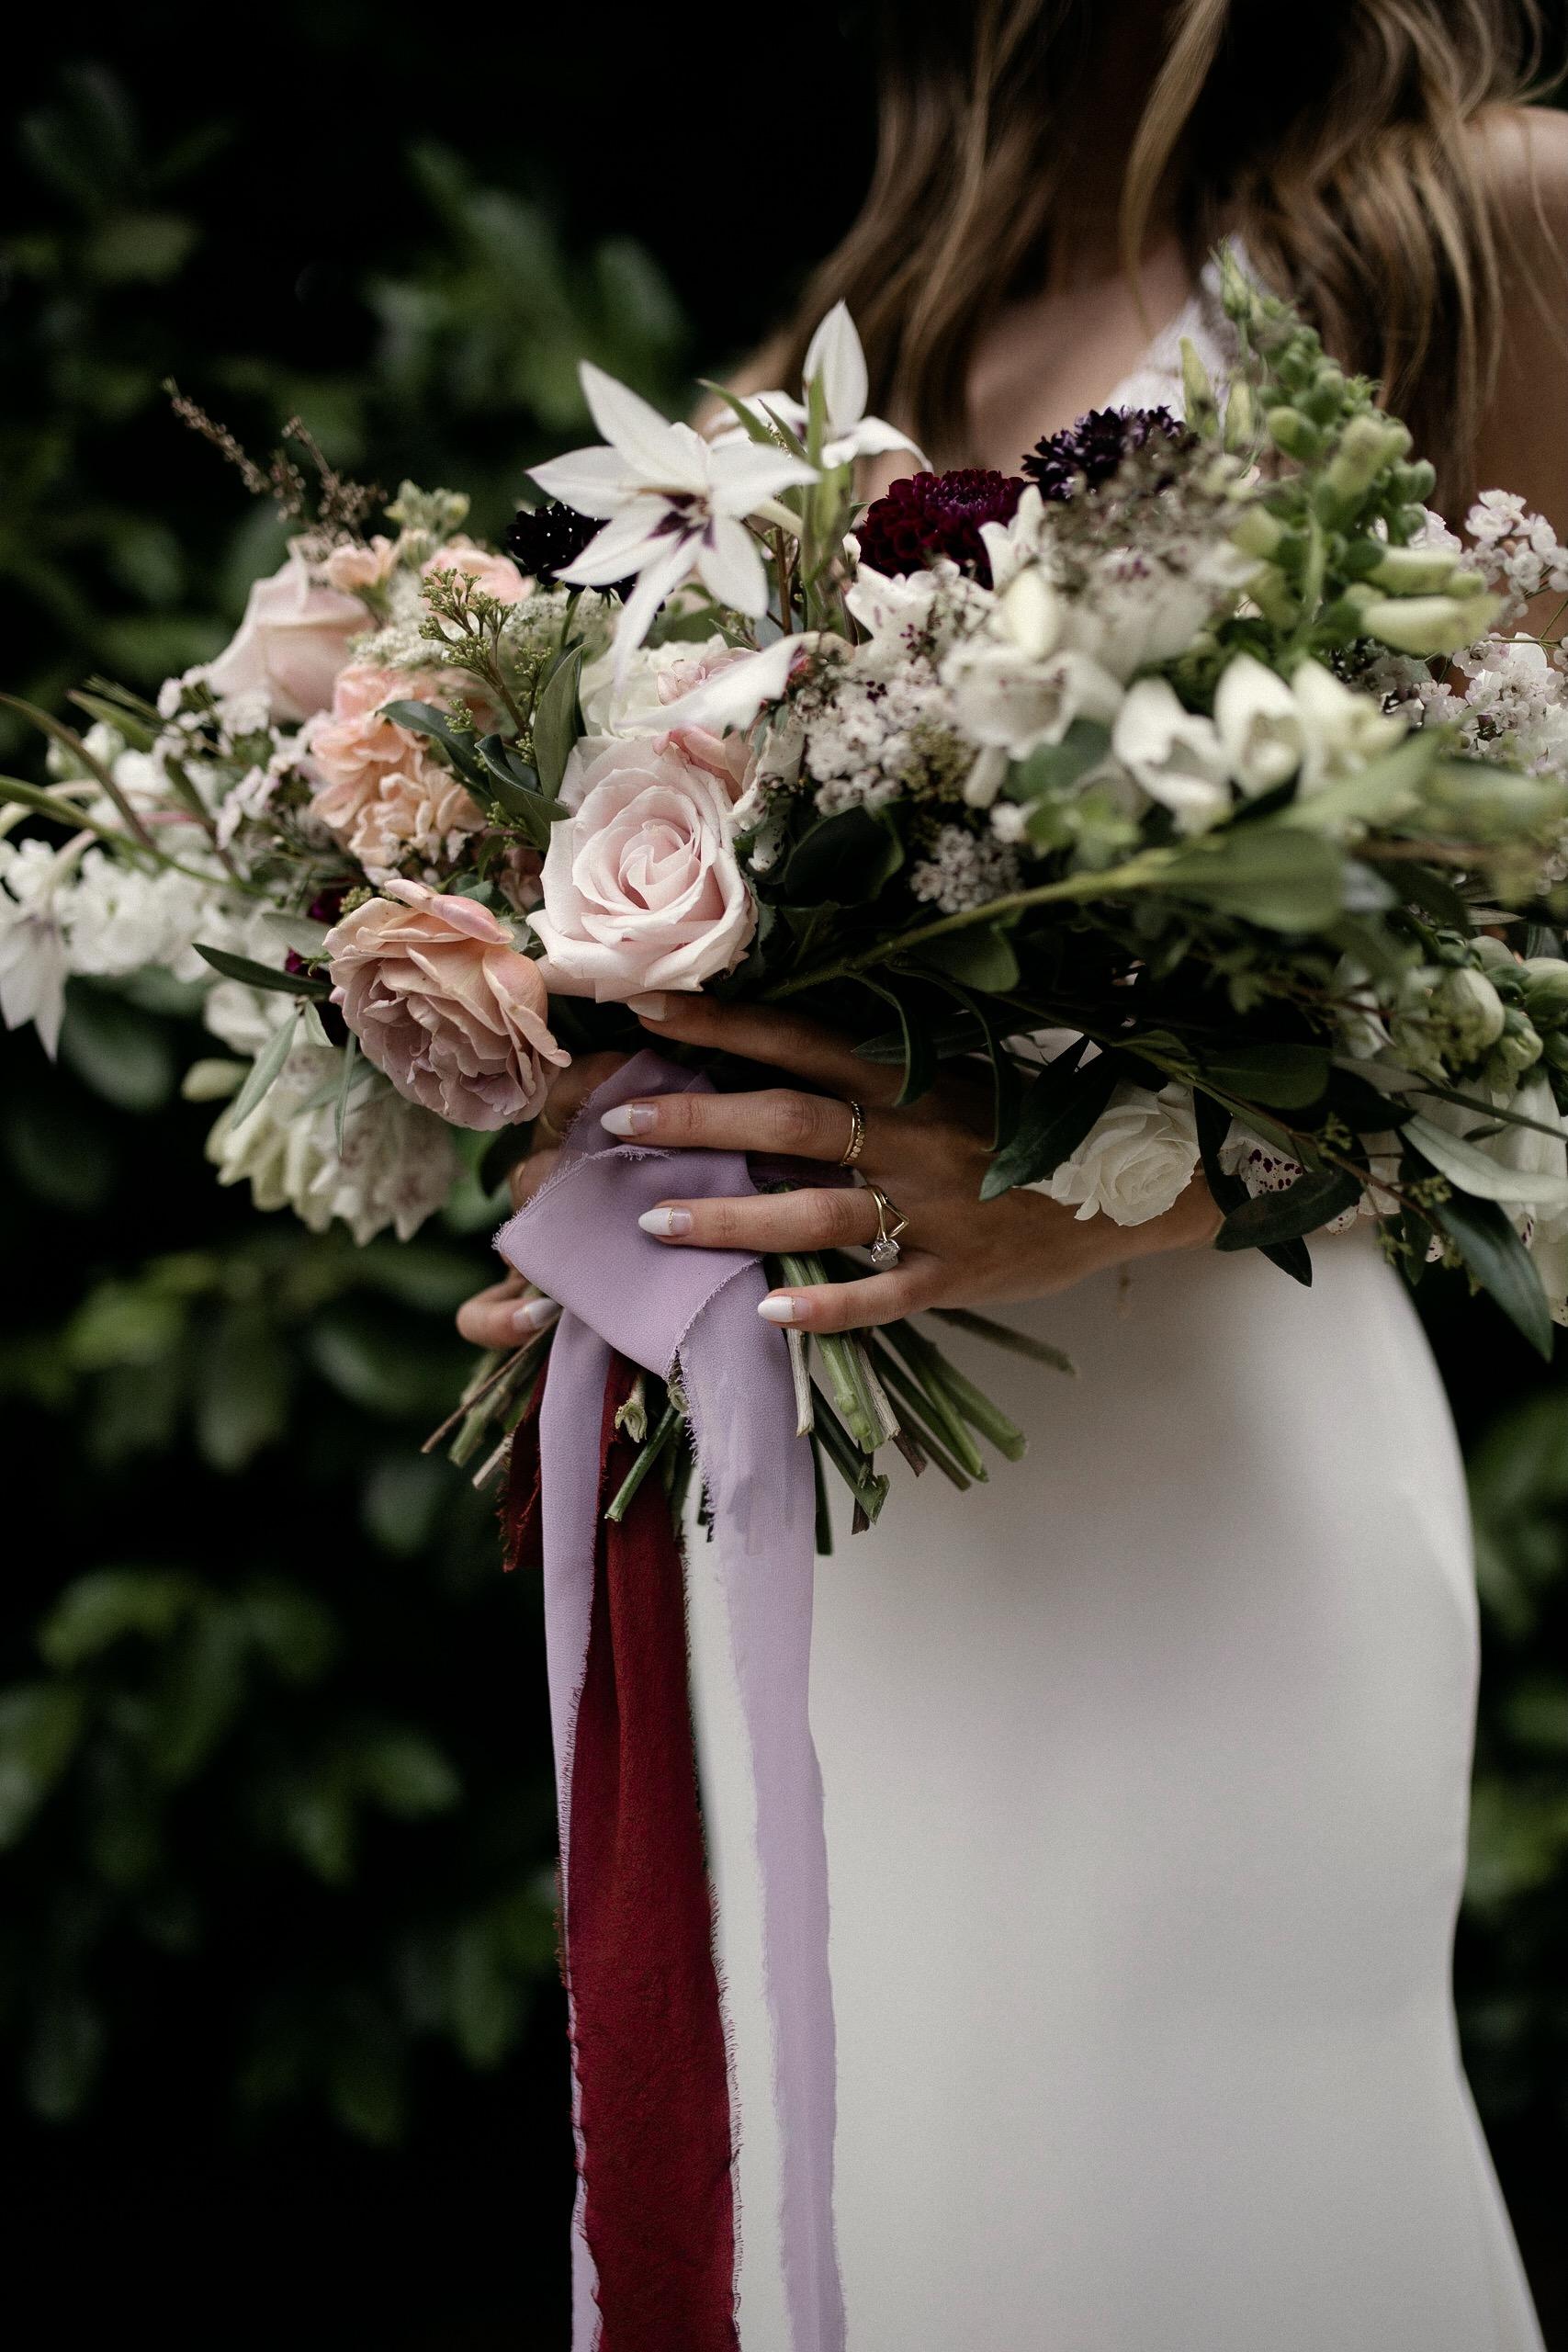 Bride details Brier and Ivy wedding bouquet